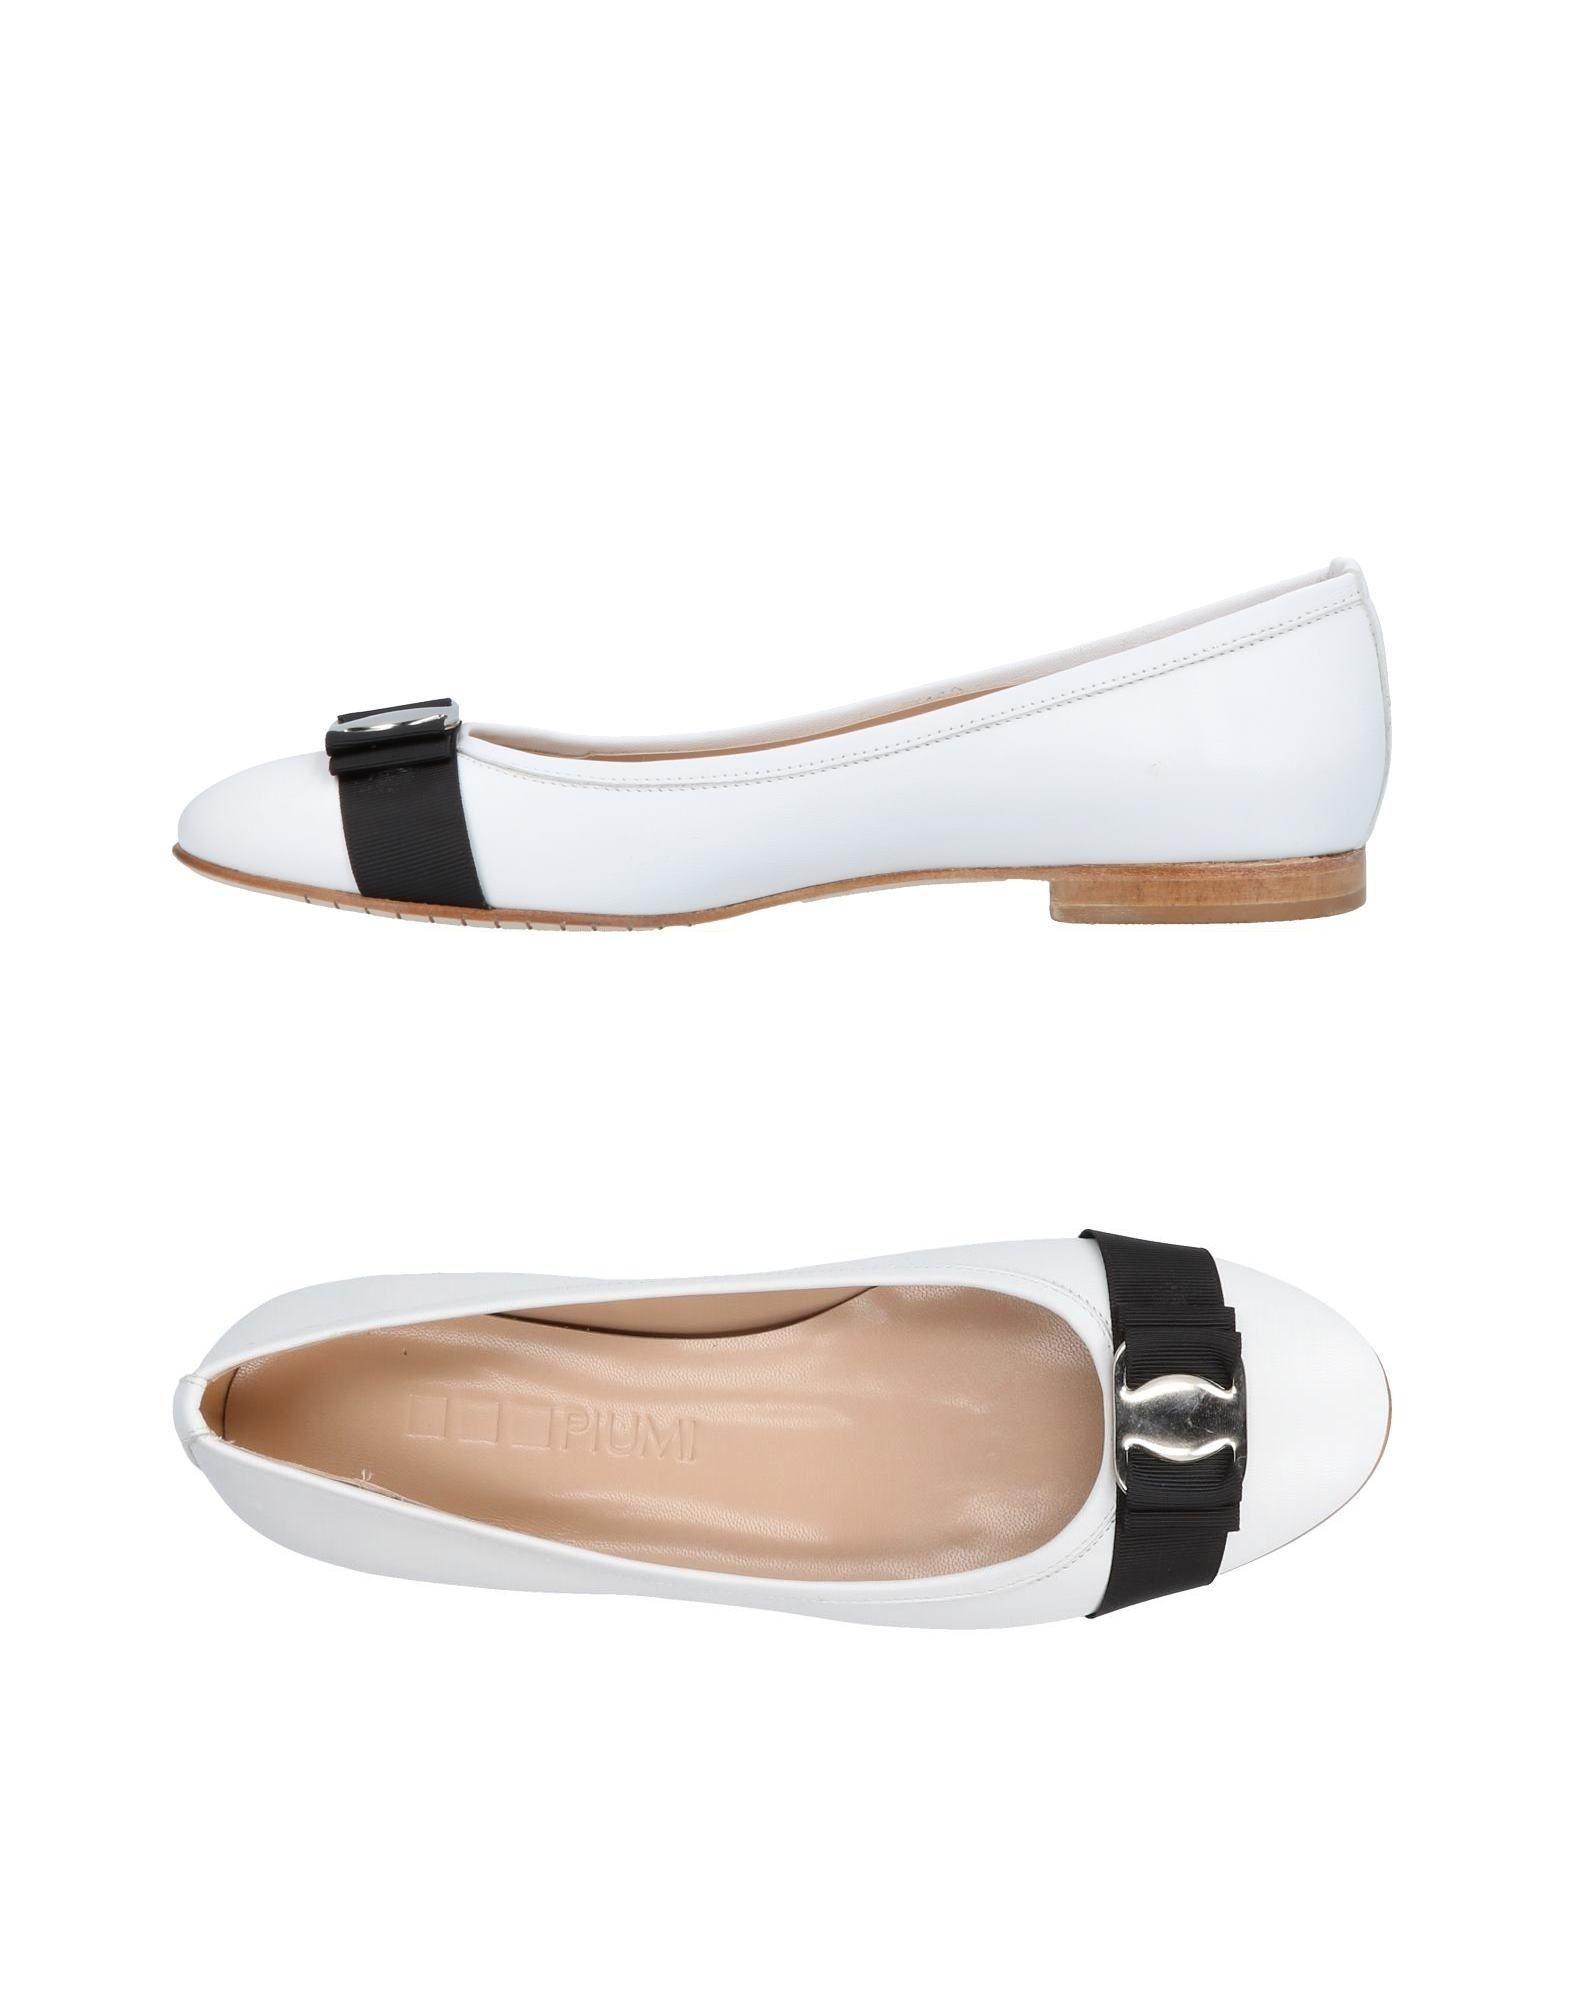 Piumi Ballerinas Damen  11467914QK Gute Qualität beliebte Schuhe